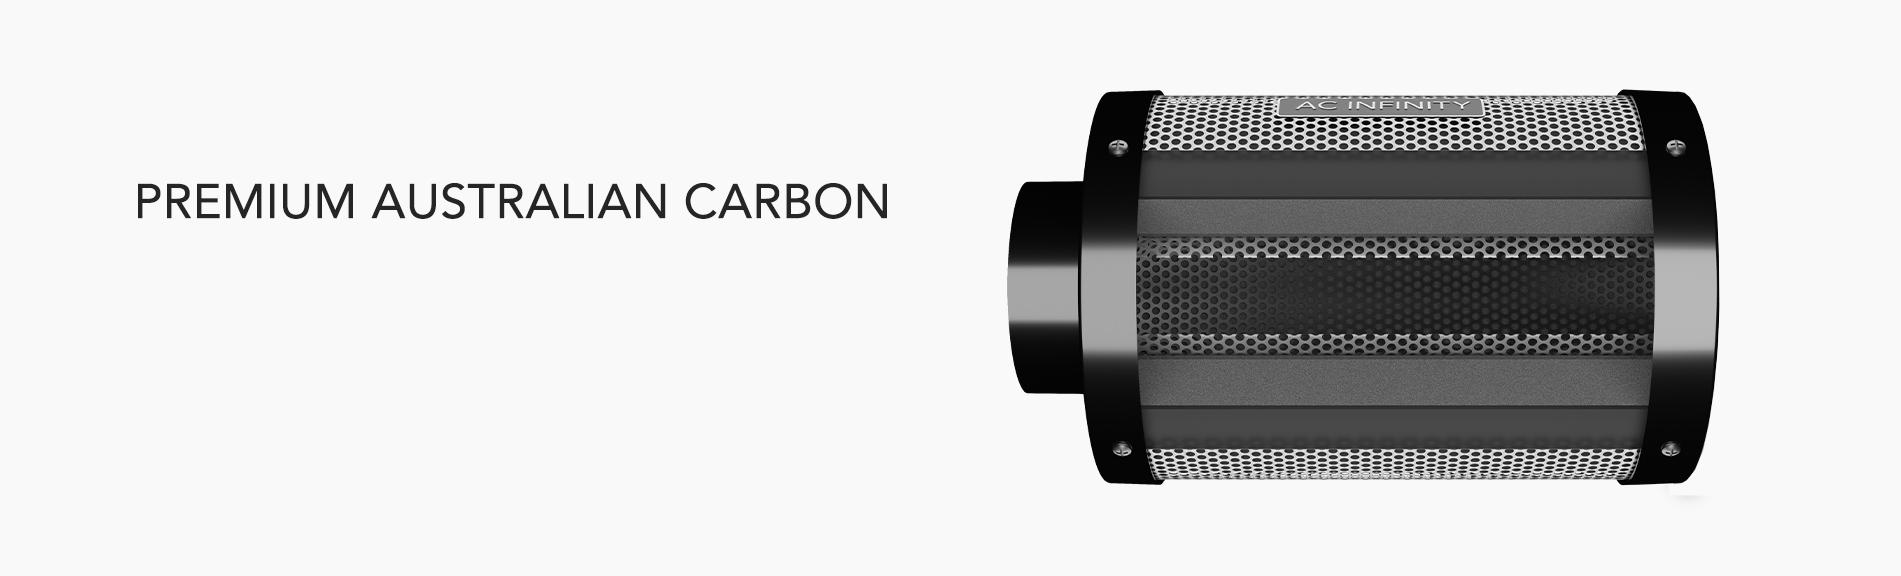 carbonfilterlandinga3.jpg